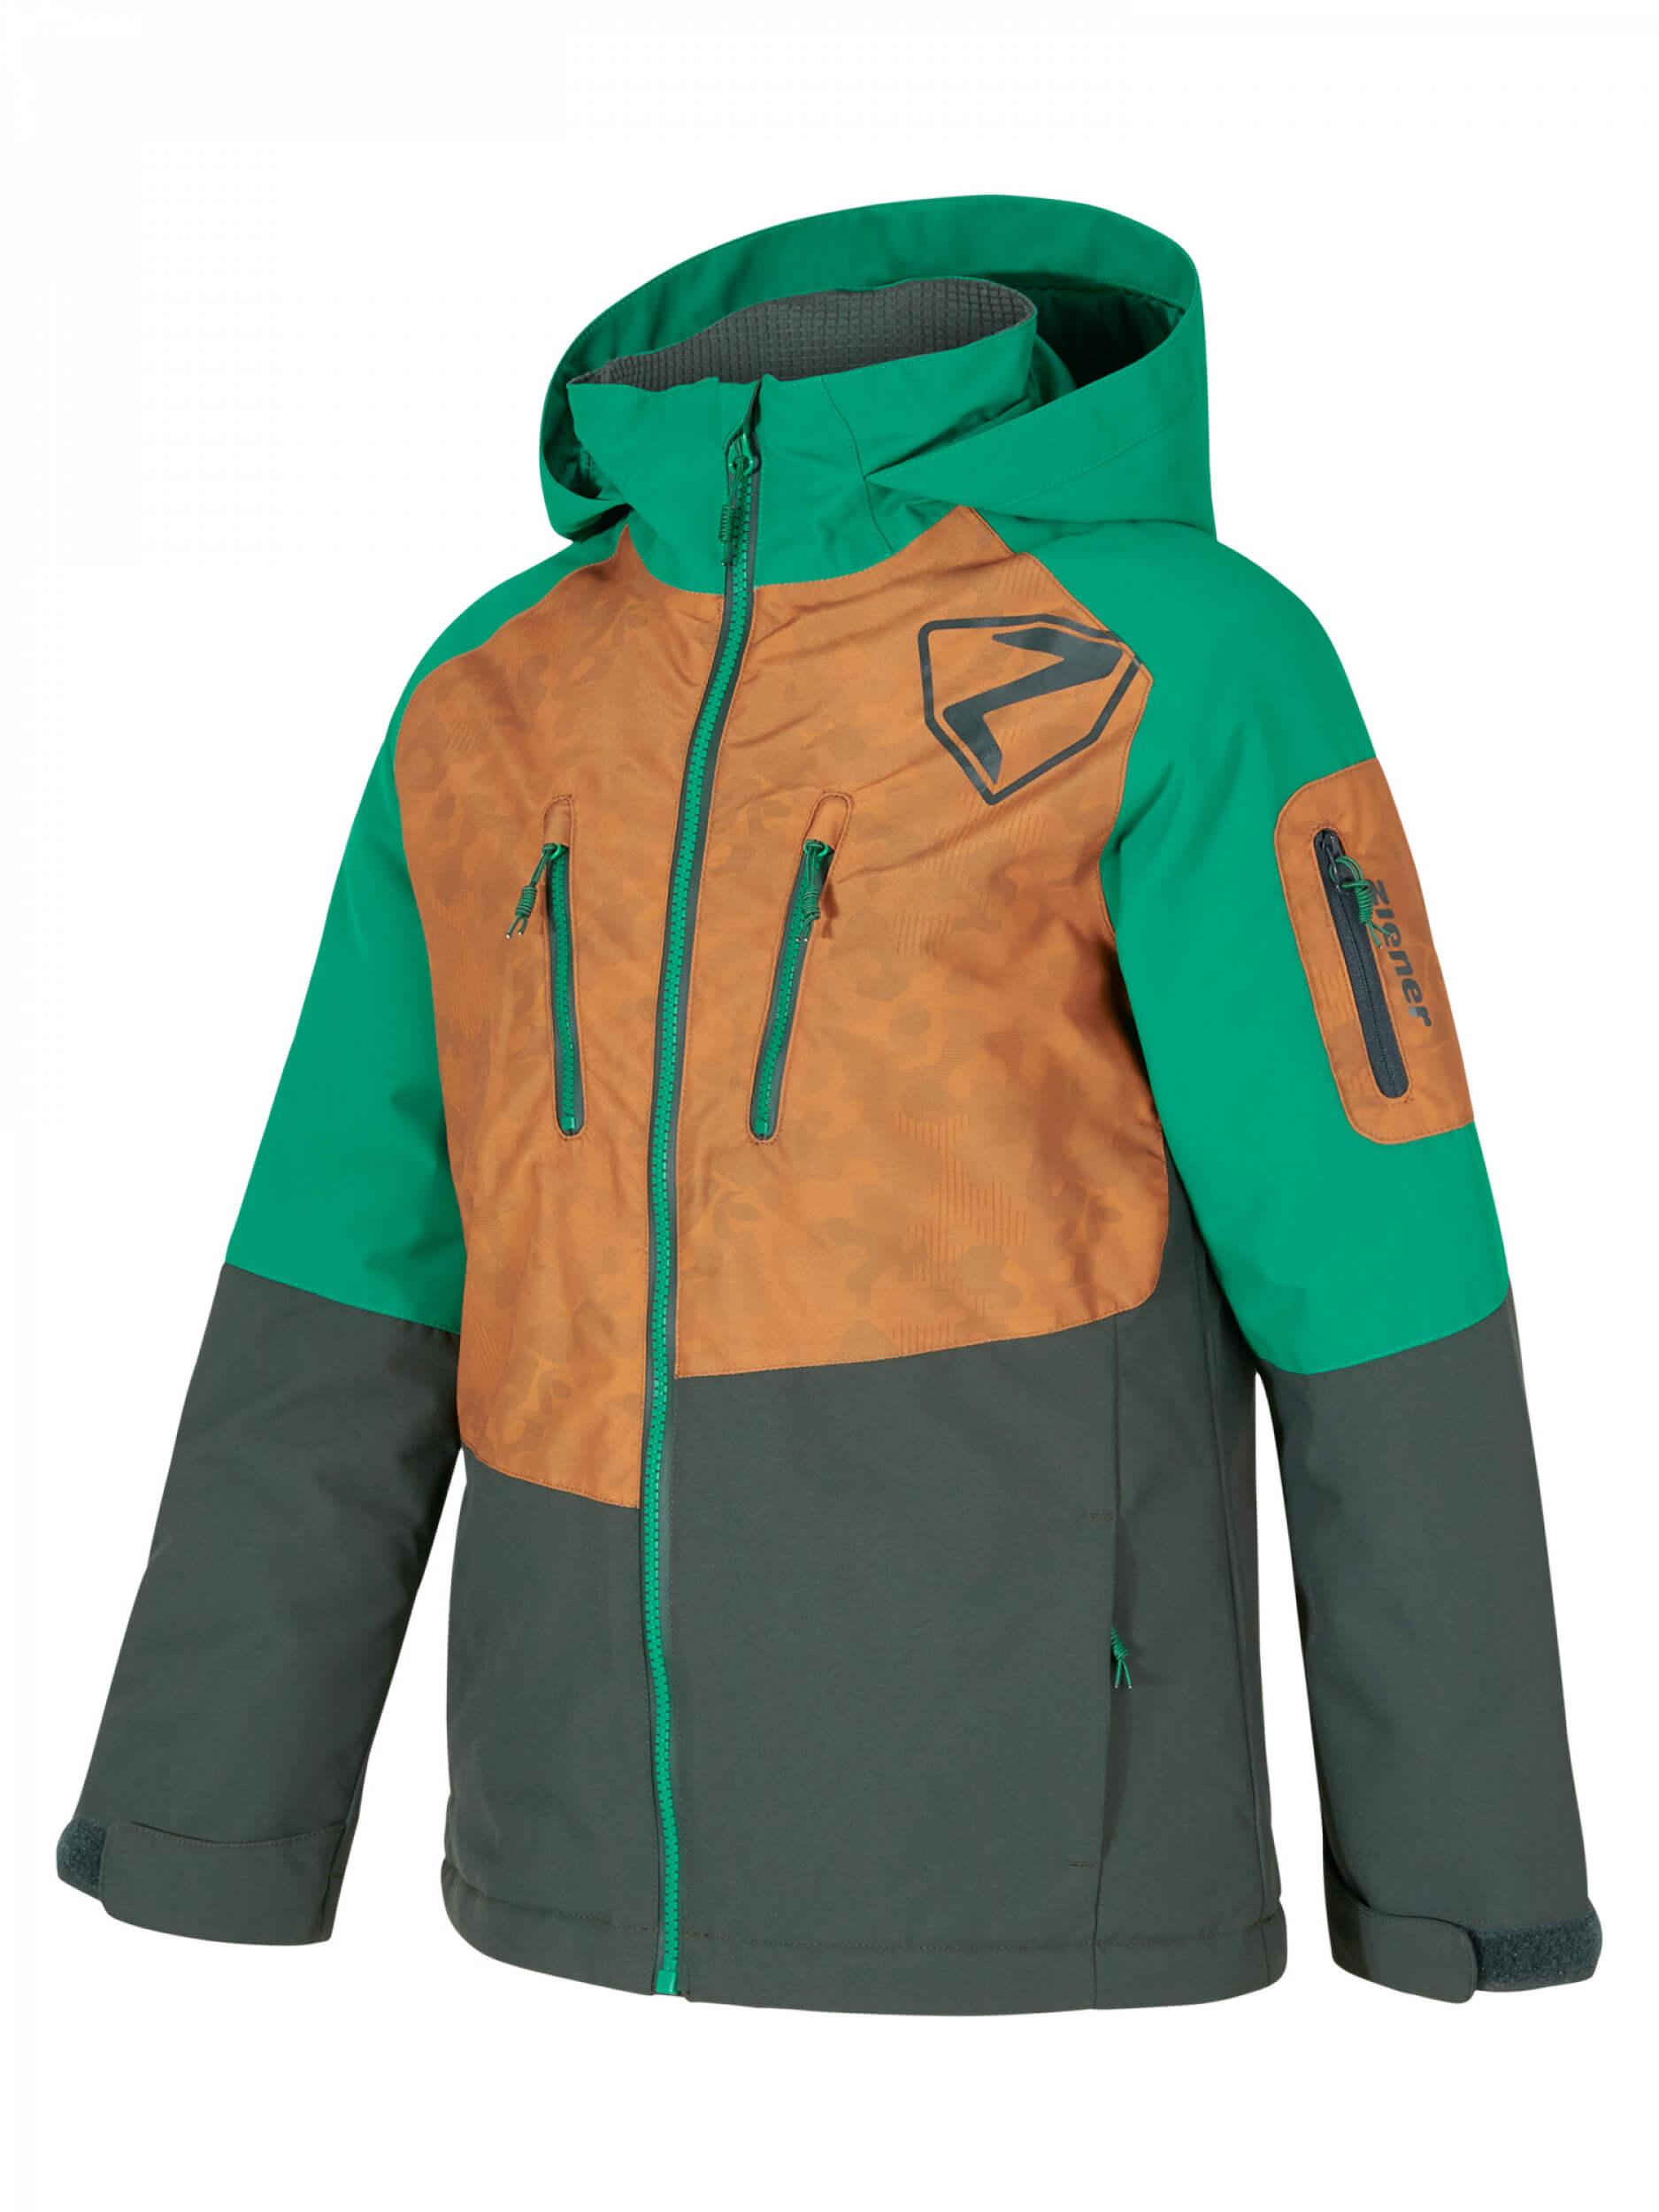 ZIENER Kinder Skijacke Anoah AQUASHIELD braun grün 938